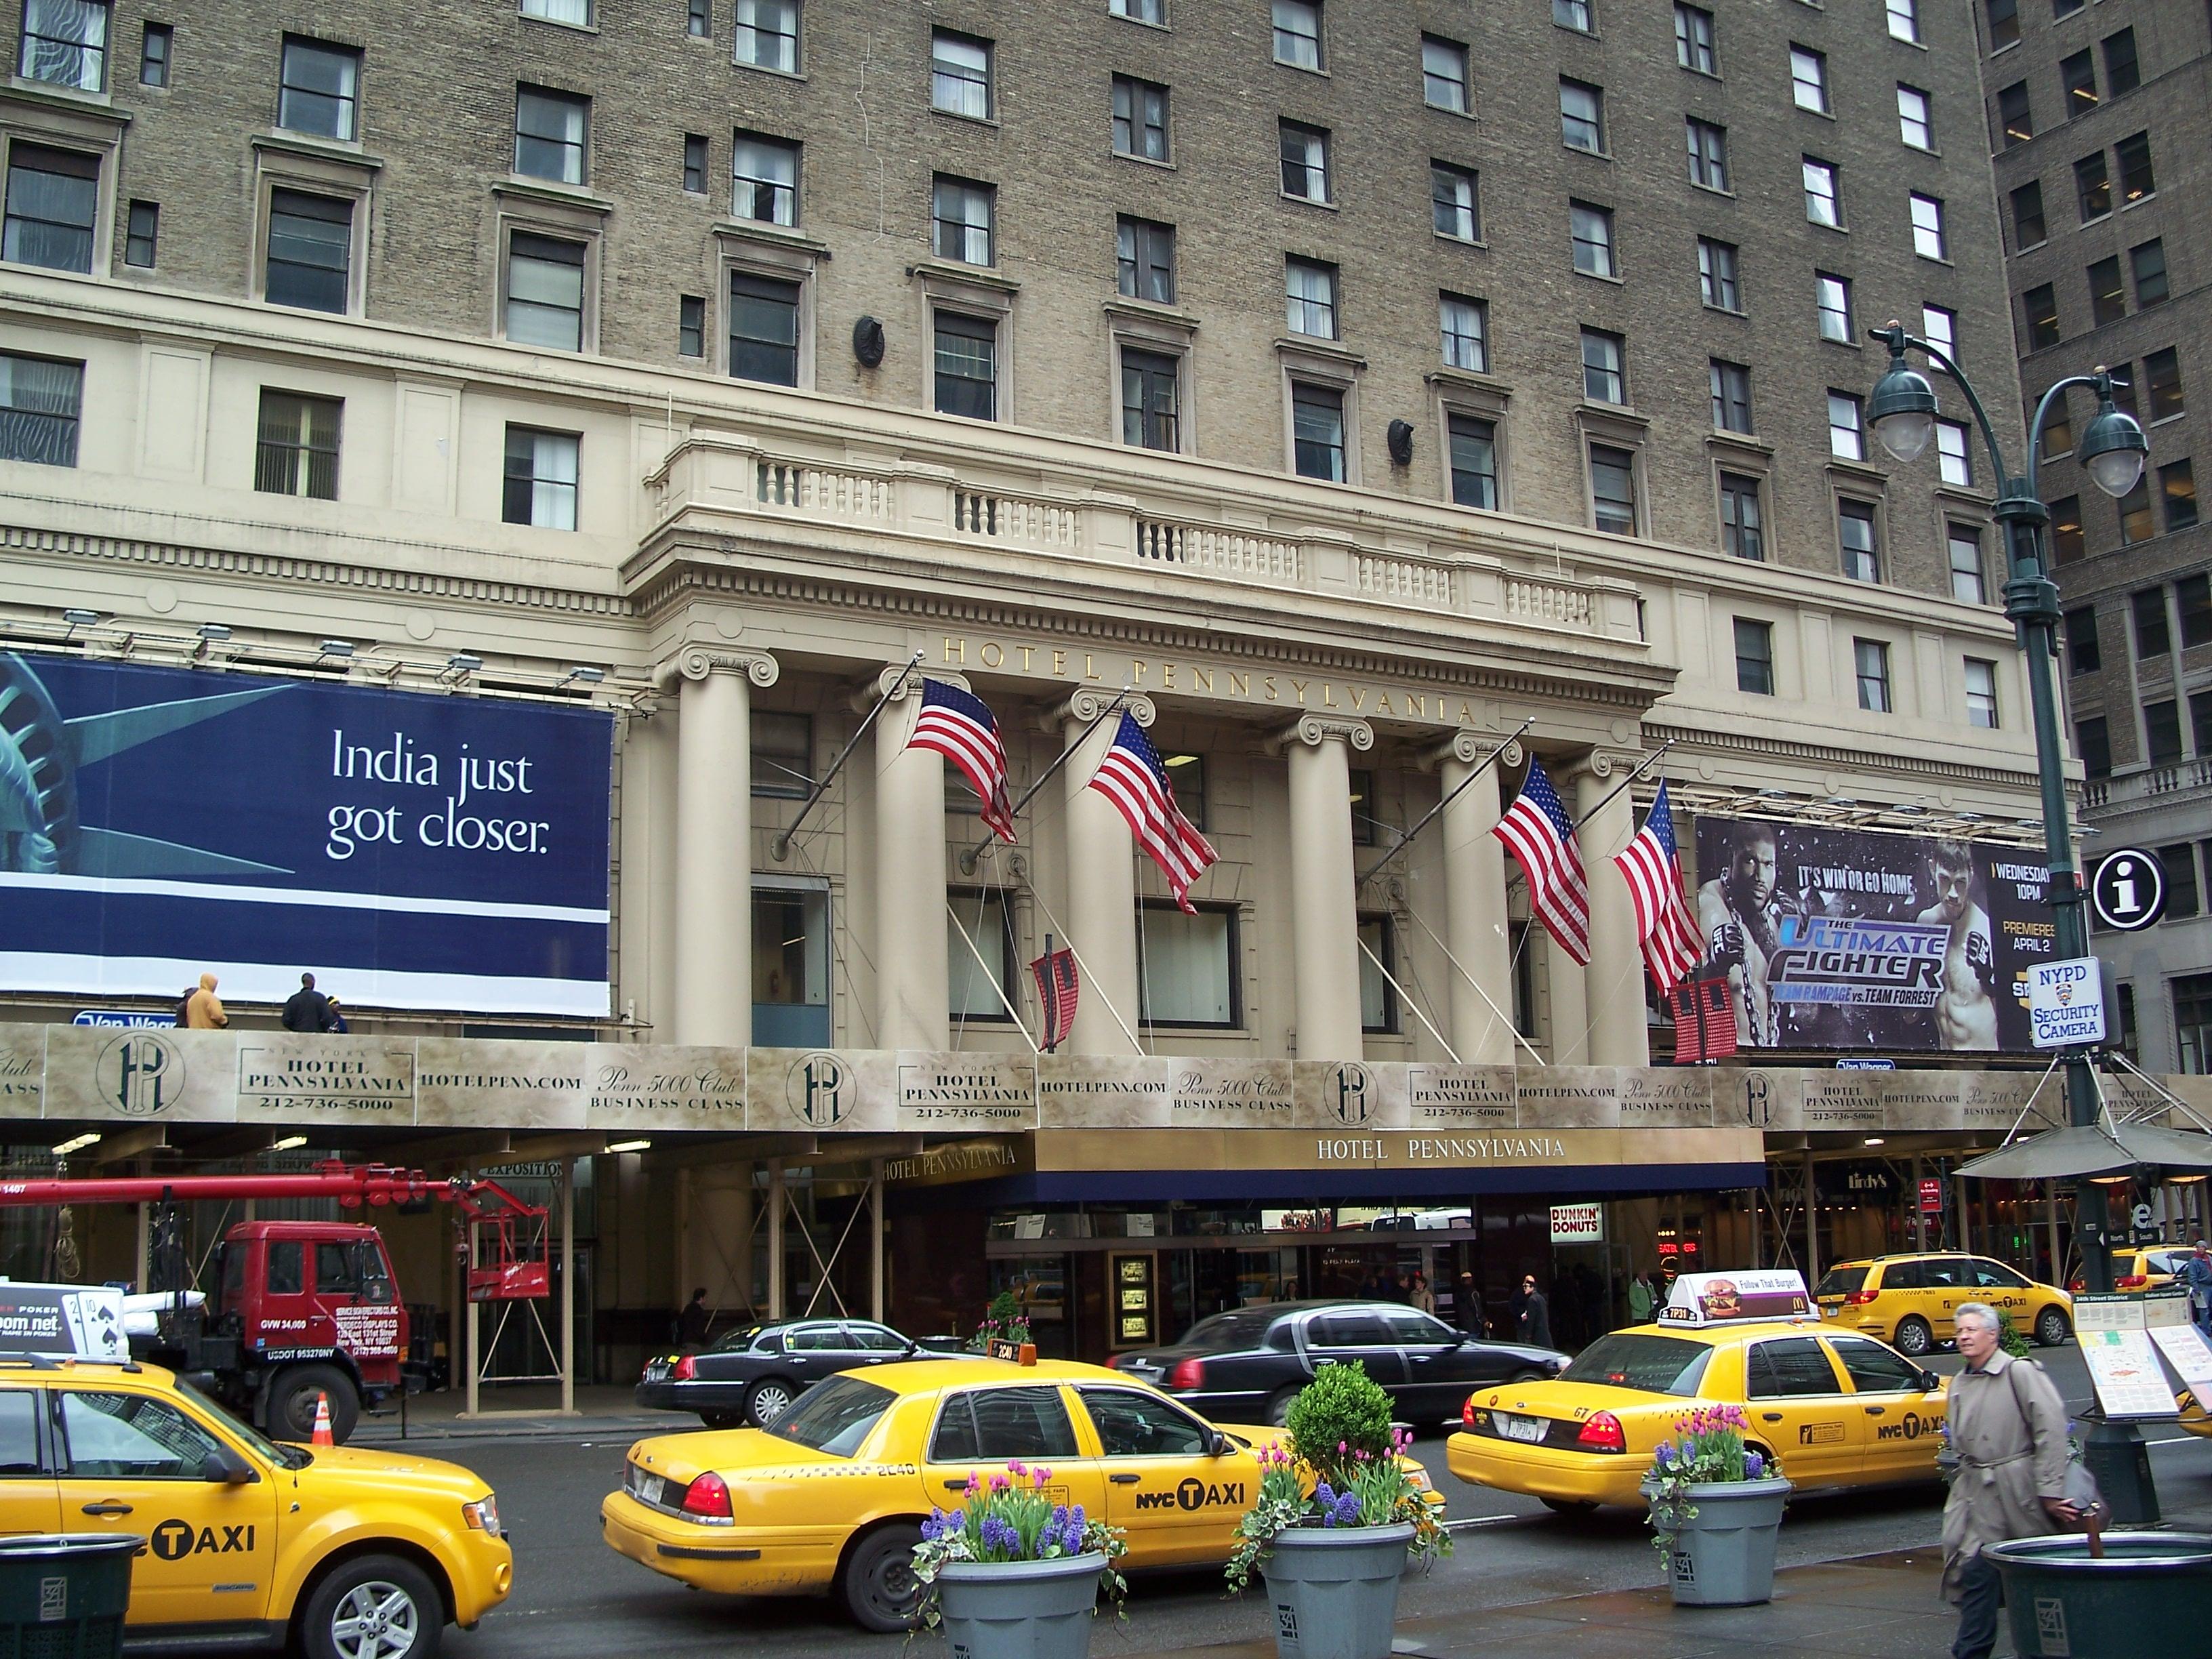 Hotel pennsylvania new york for 24 hour nail salon new york city